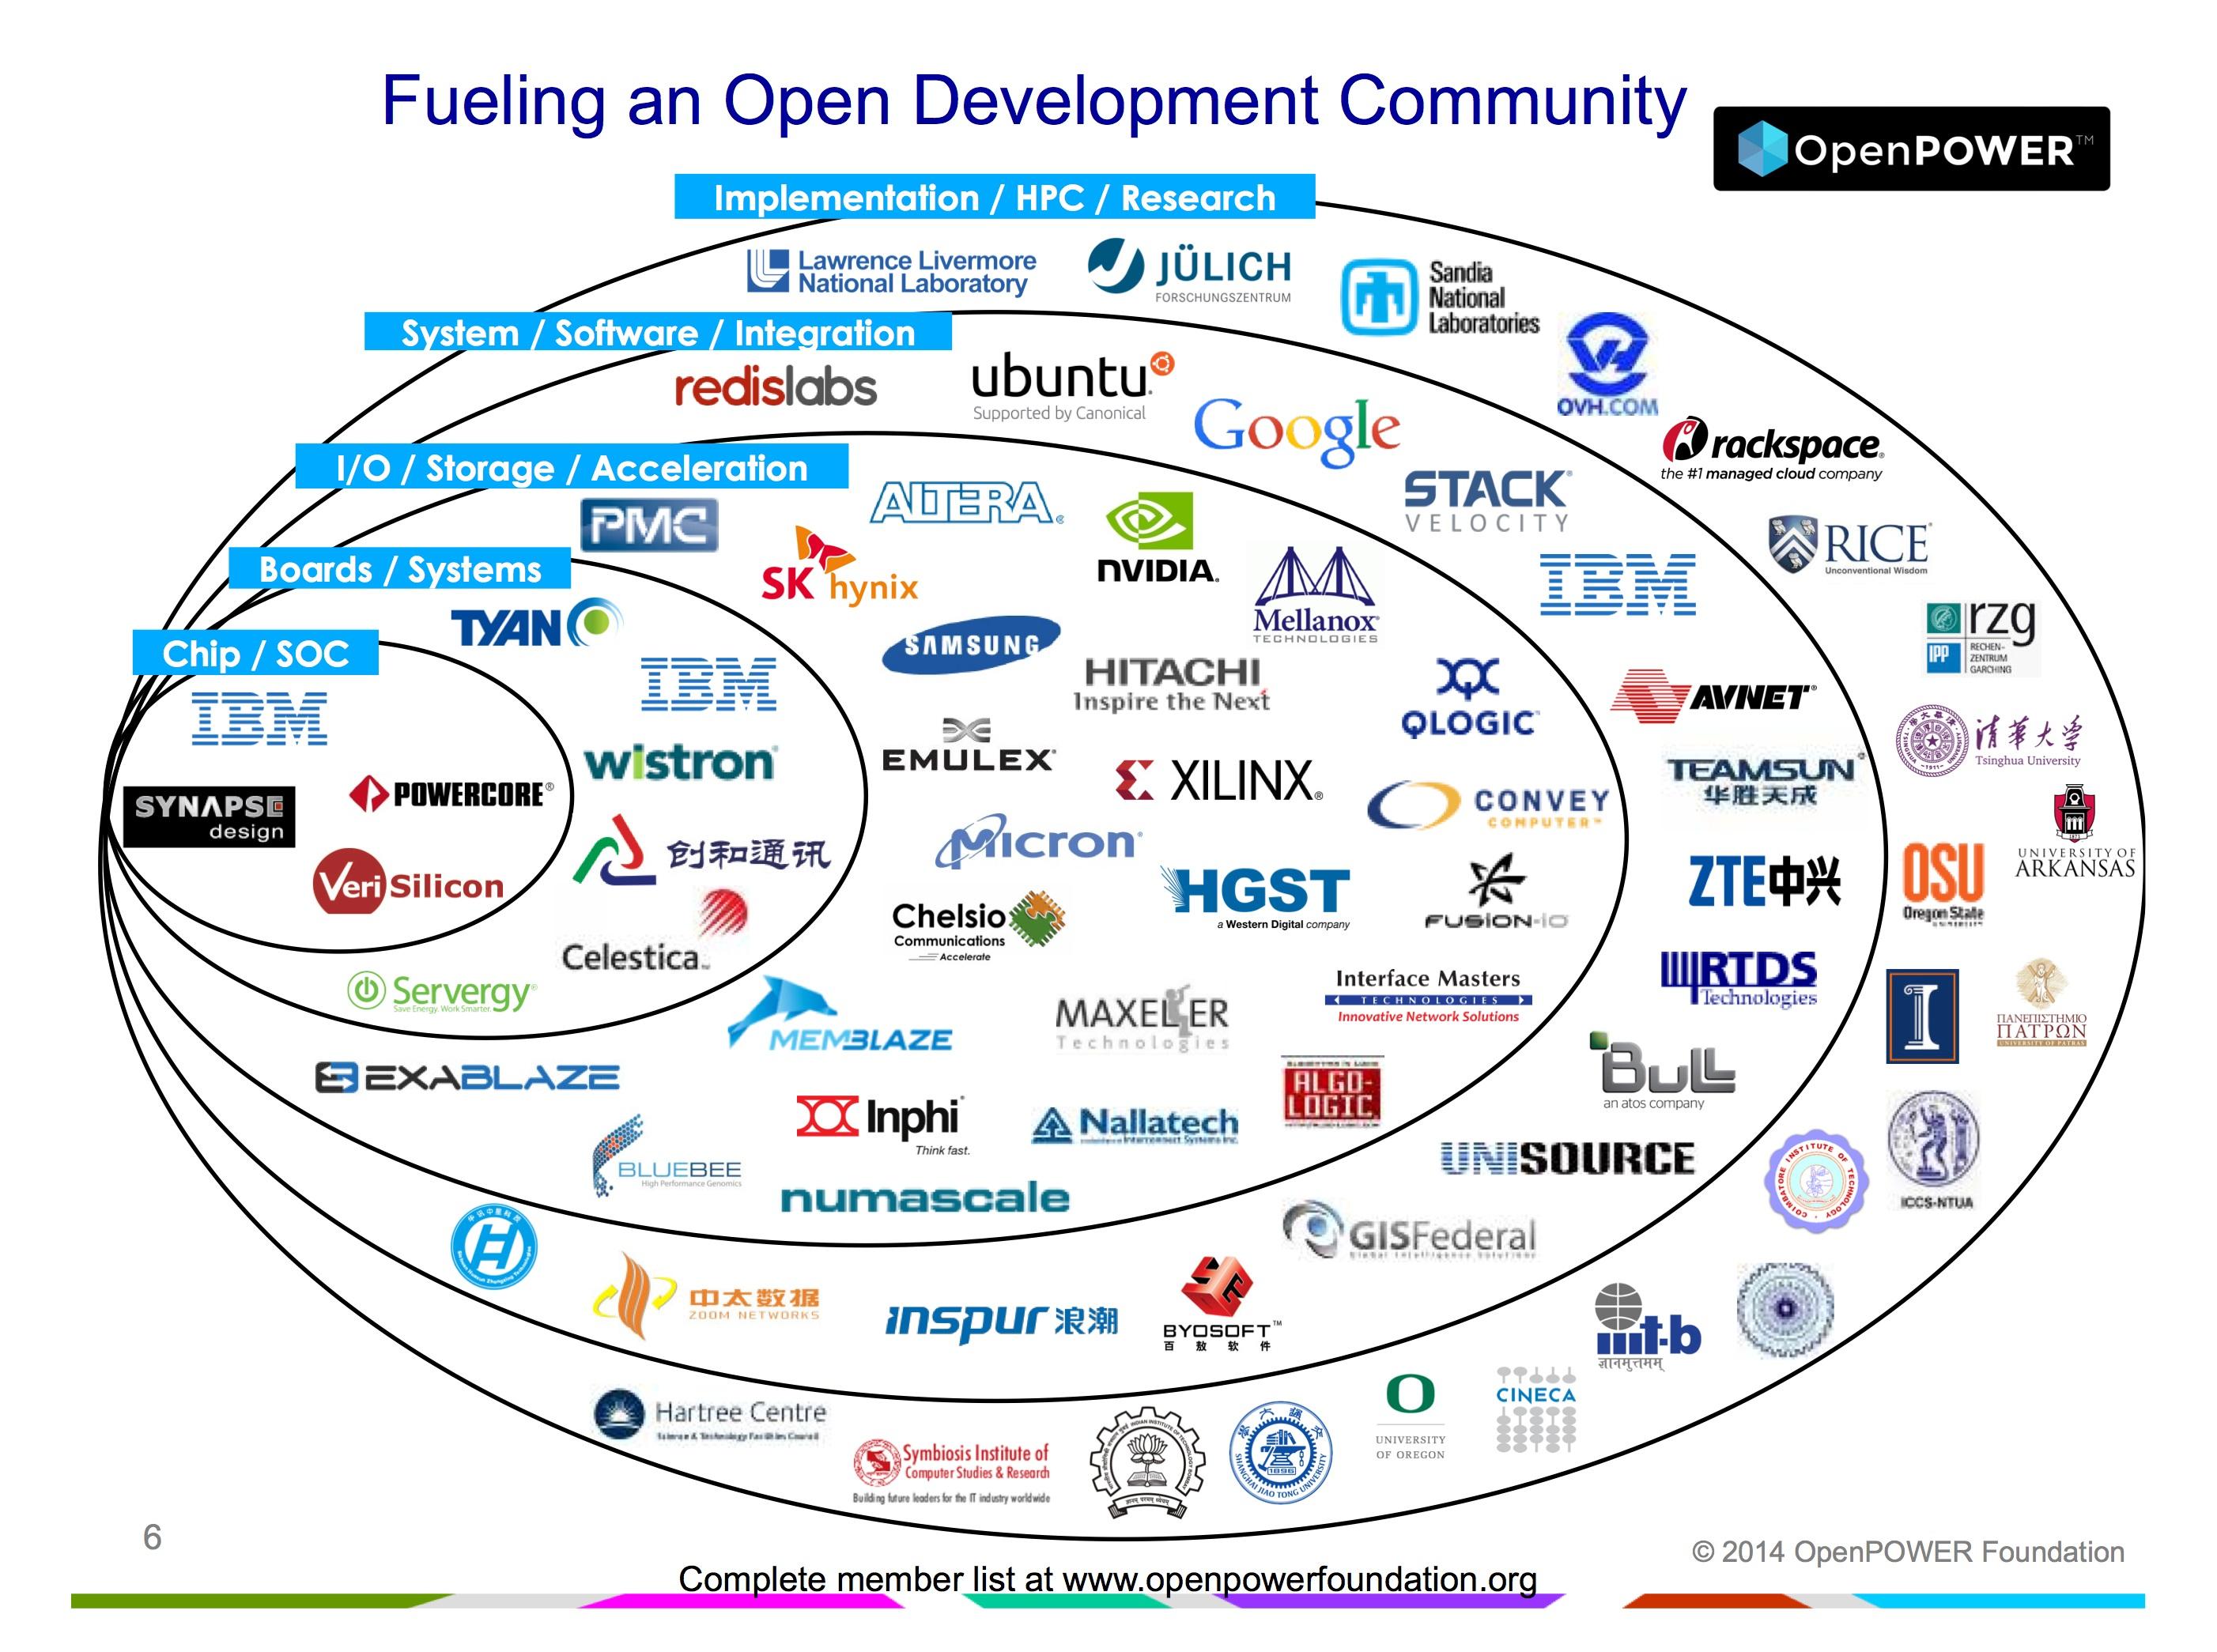 OpenPOWER members